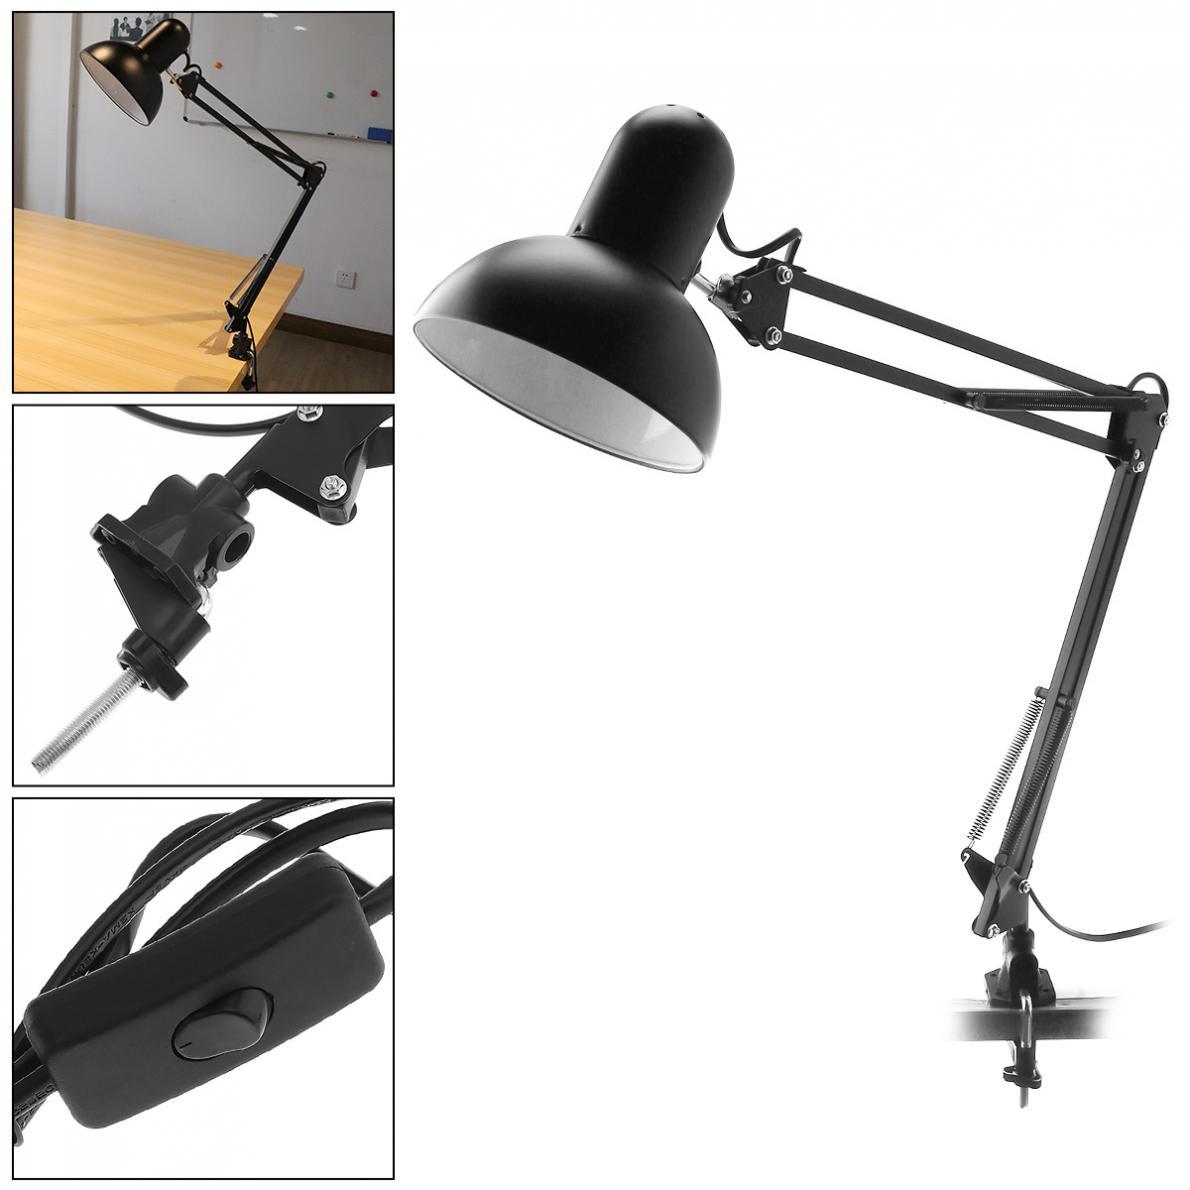 Black Desk Lamp E27 Flexible Swing Arm Light 360 Degree Rotation Head and Mount for Office Home